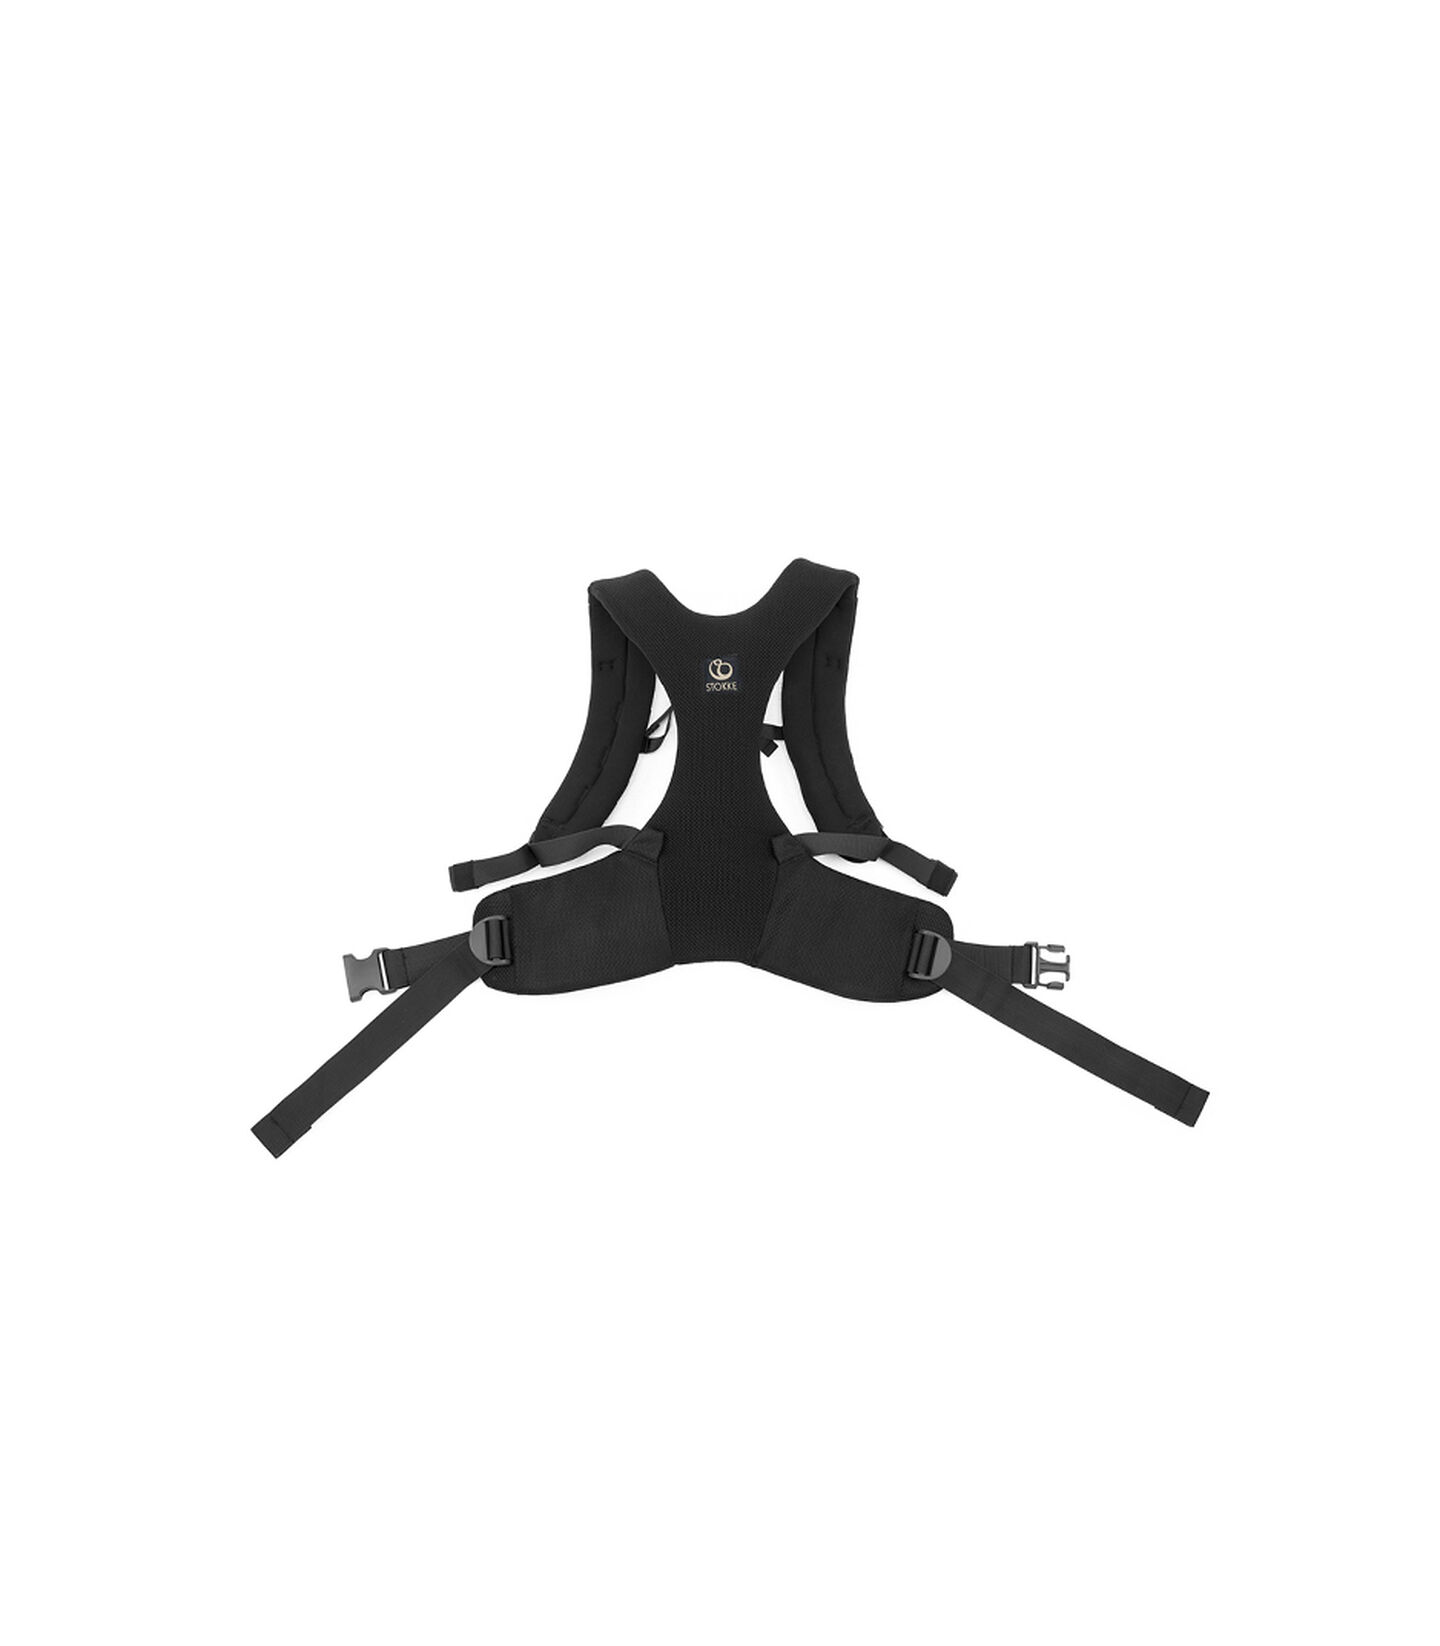 Stokke® MyCarrier™ Harness, Black Mesh. view 4